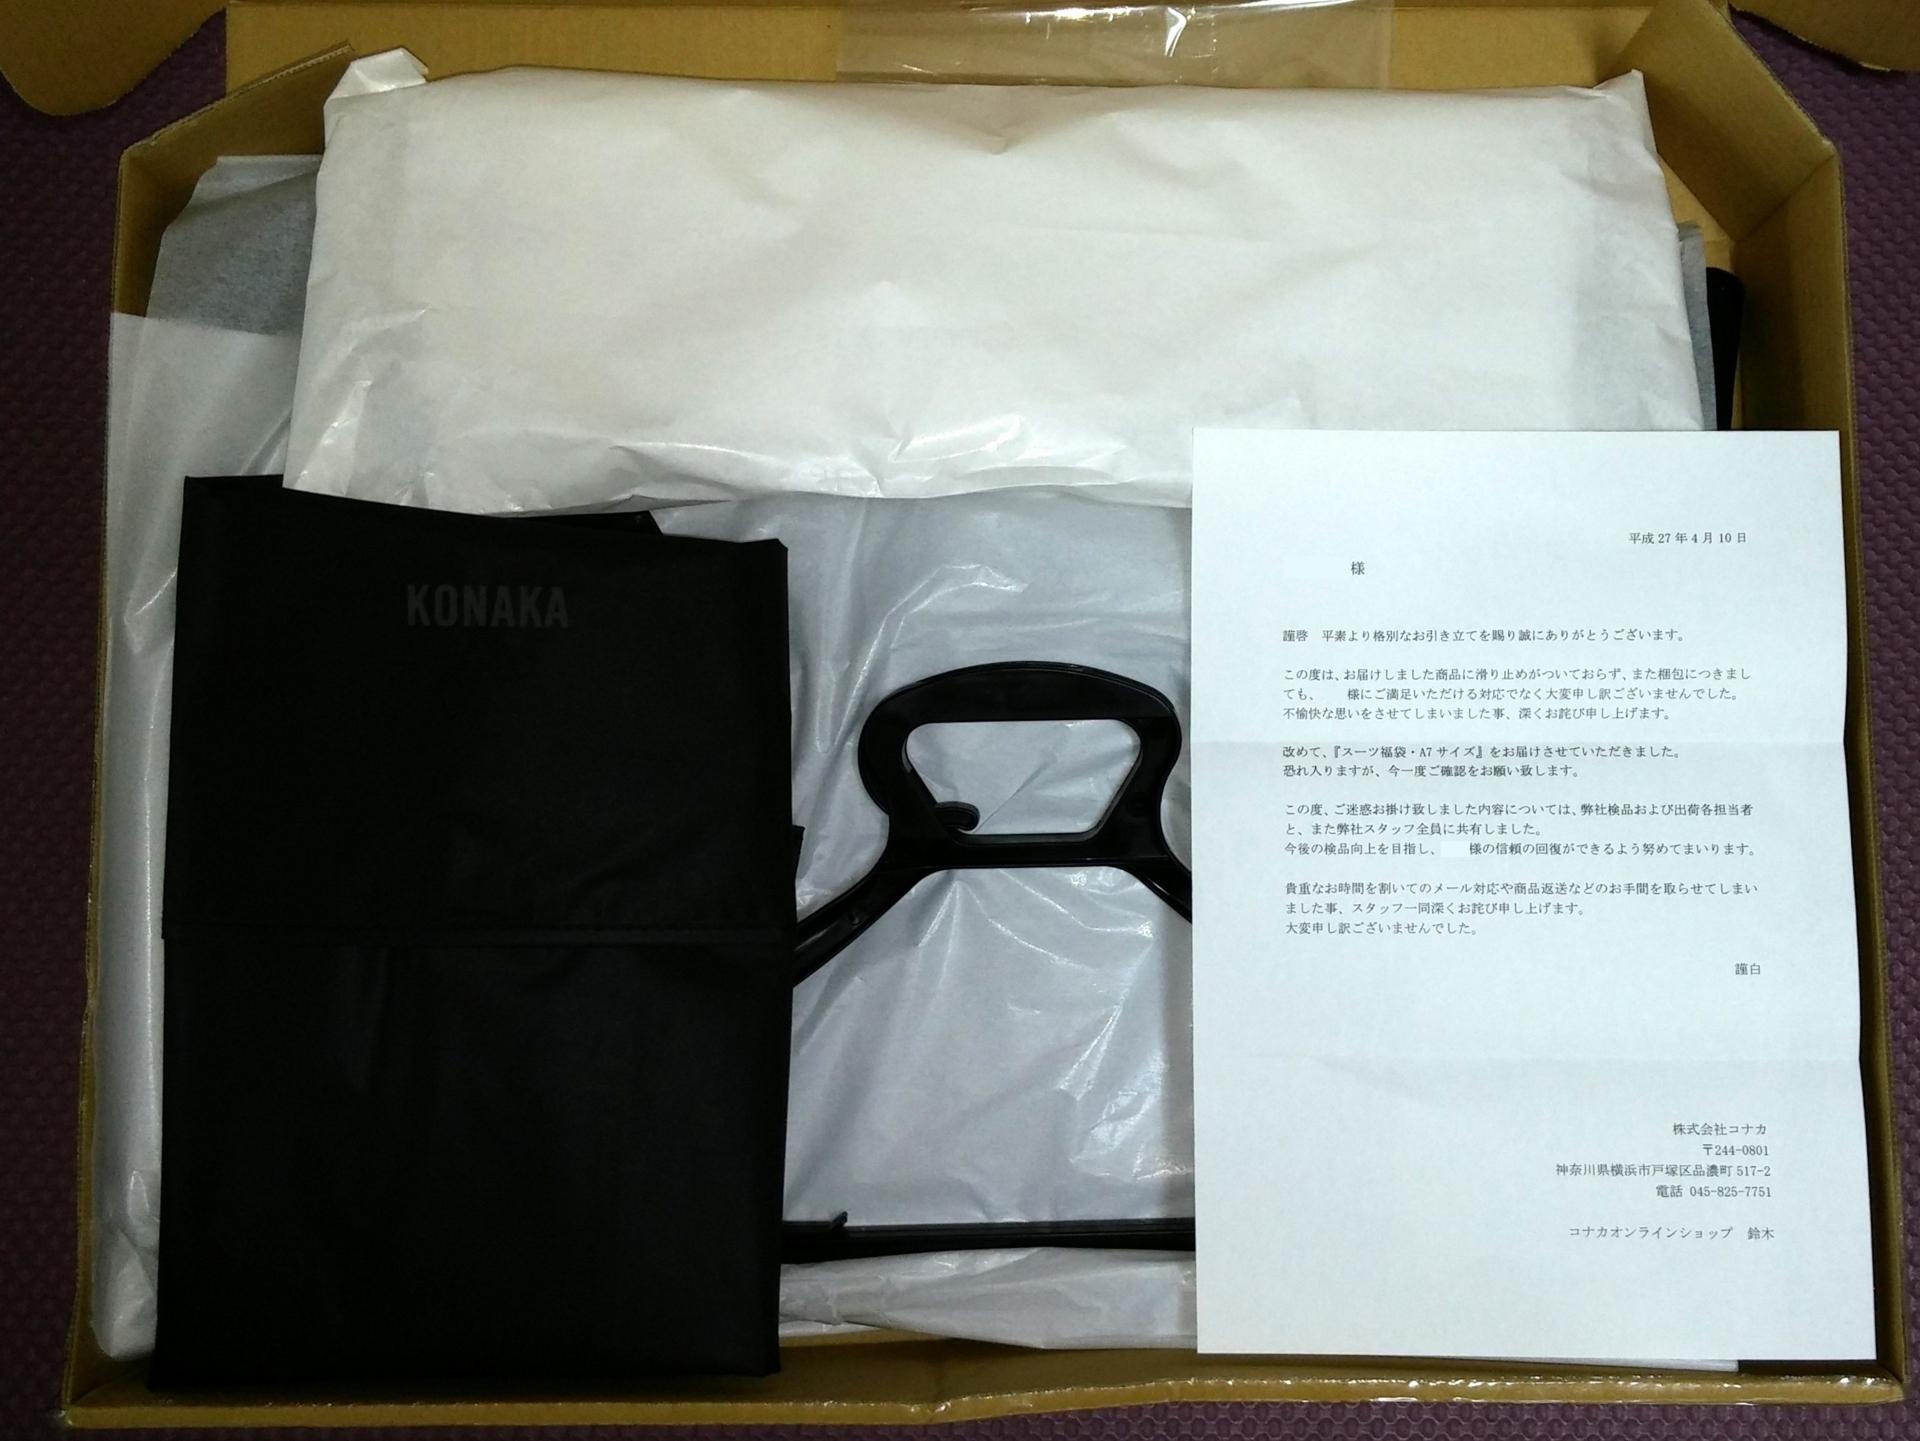 f:id:ToshUeno:20150411175316j:plain